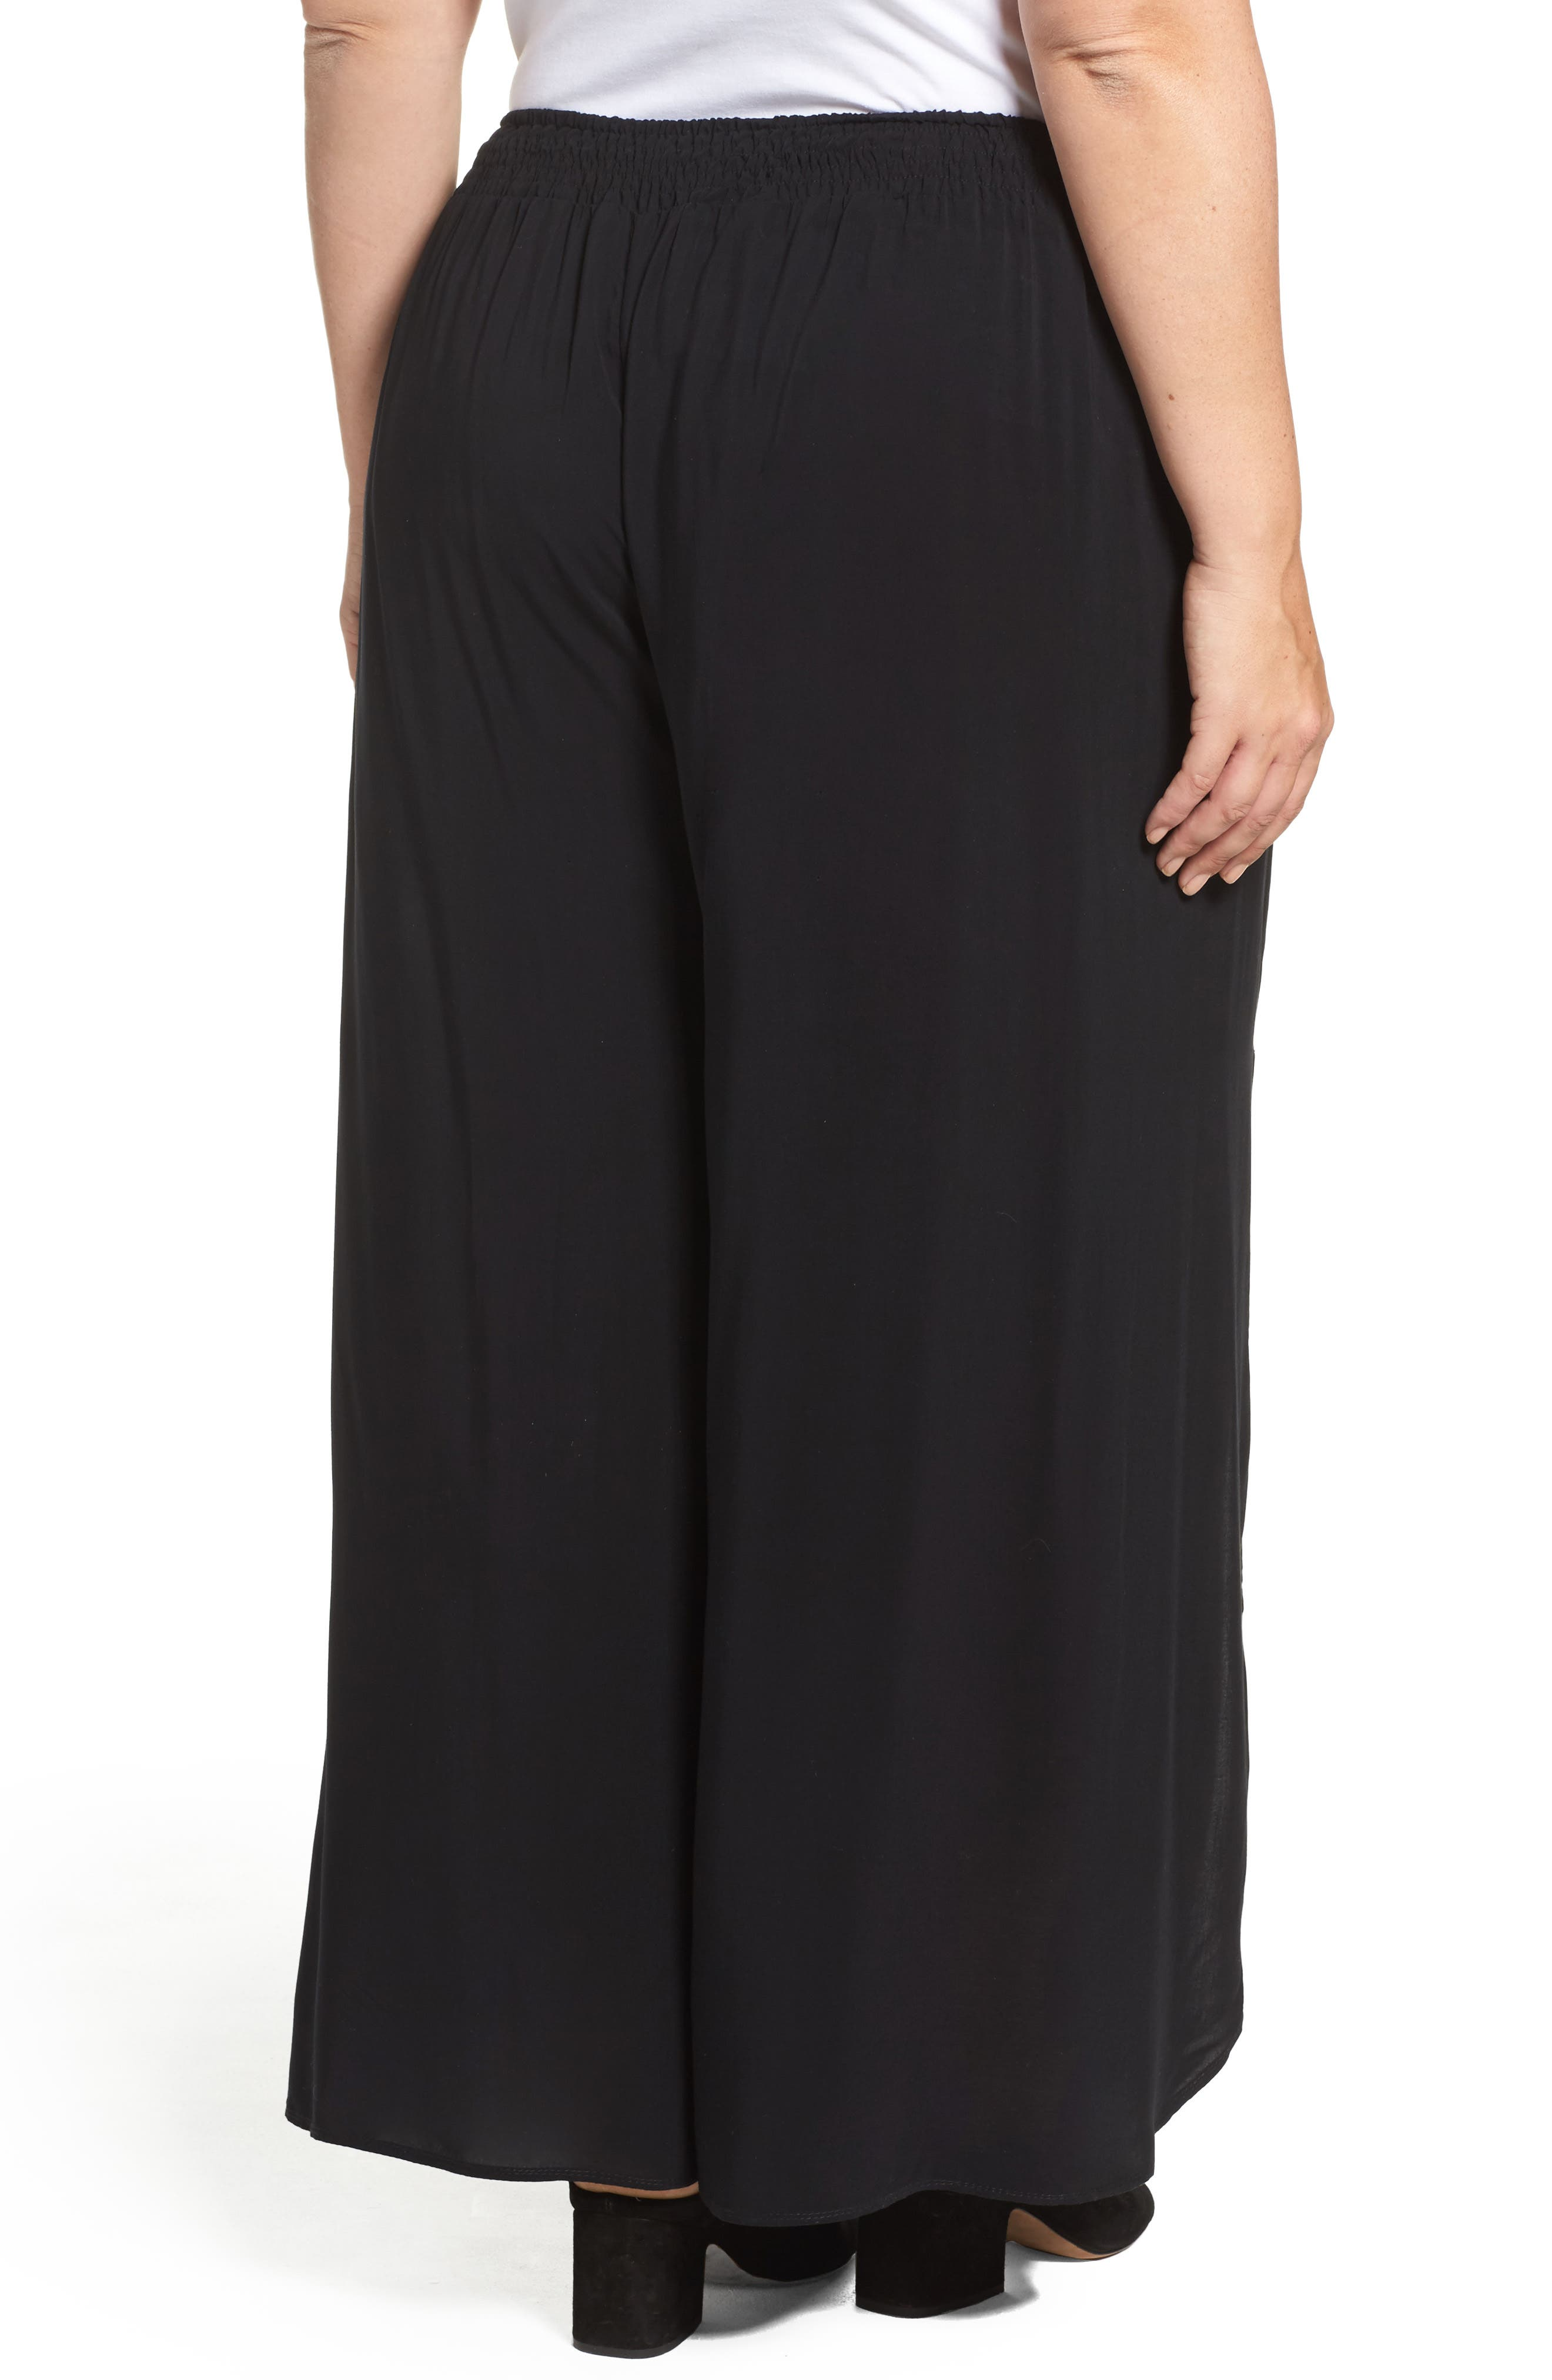 Alternate Image 3  - Tart Nima Front Slit Pants (Plus Size)